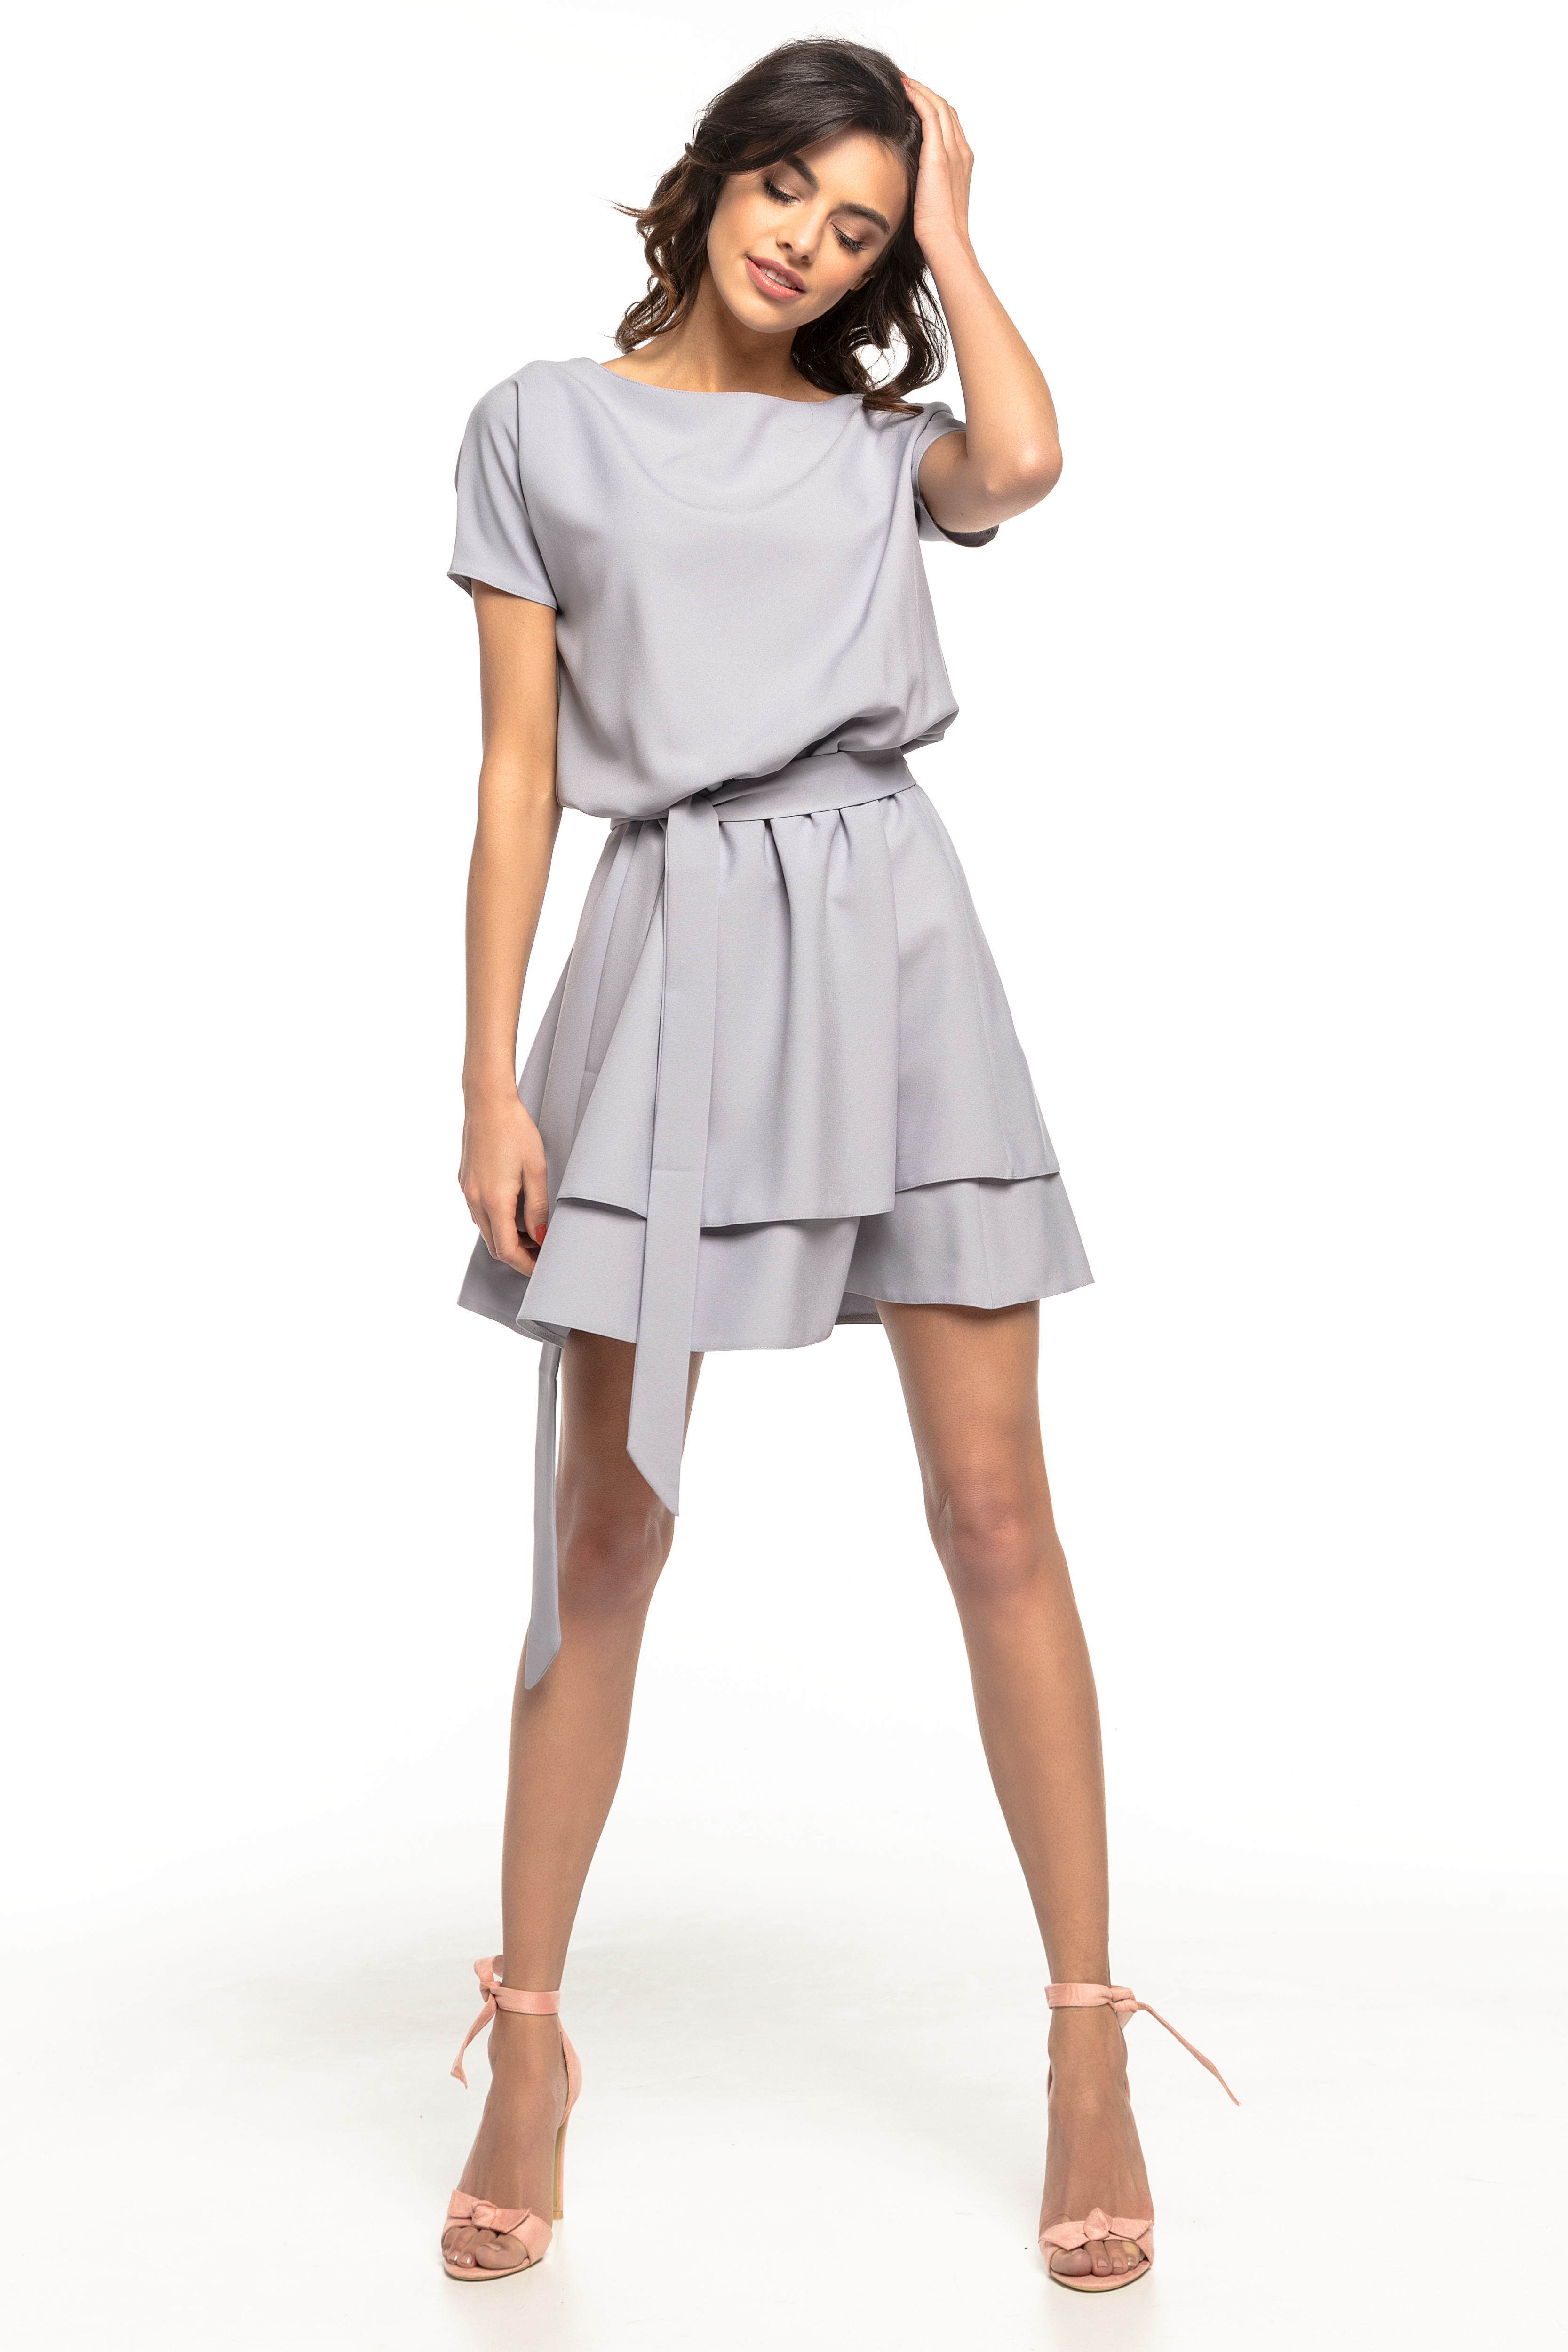 6d196f3392 Sukienka rozkloszowana elegancka szara - kurier już od 5